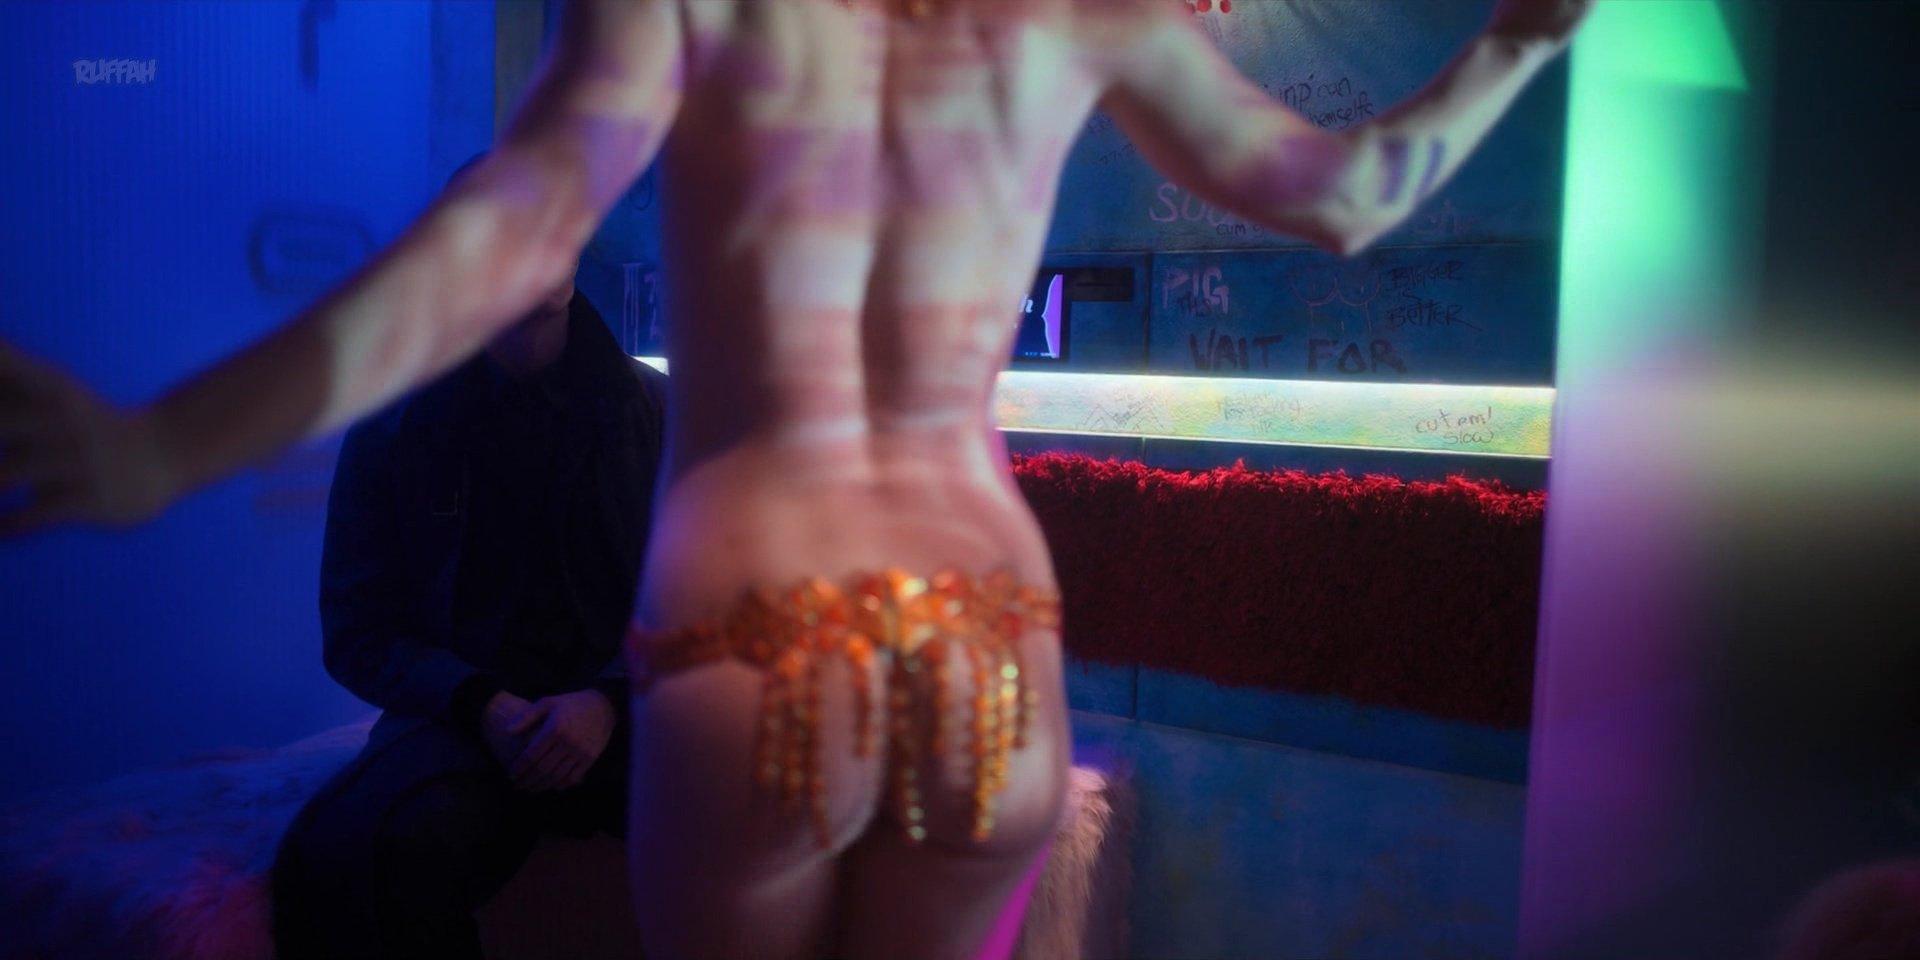 Stephanie Cleough nude - Altered Carbon s01e02 (2018)